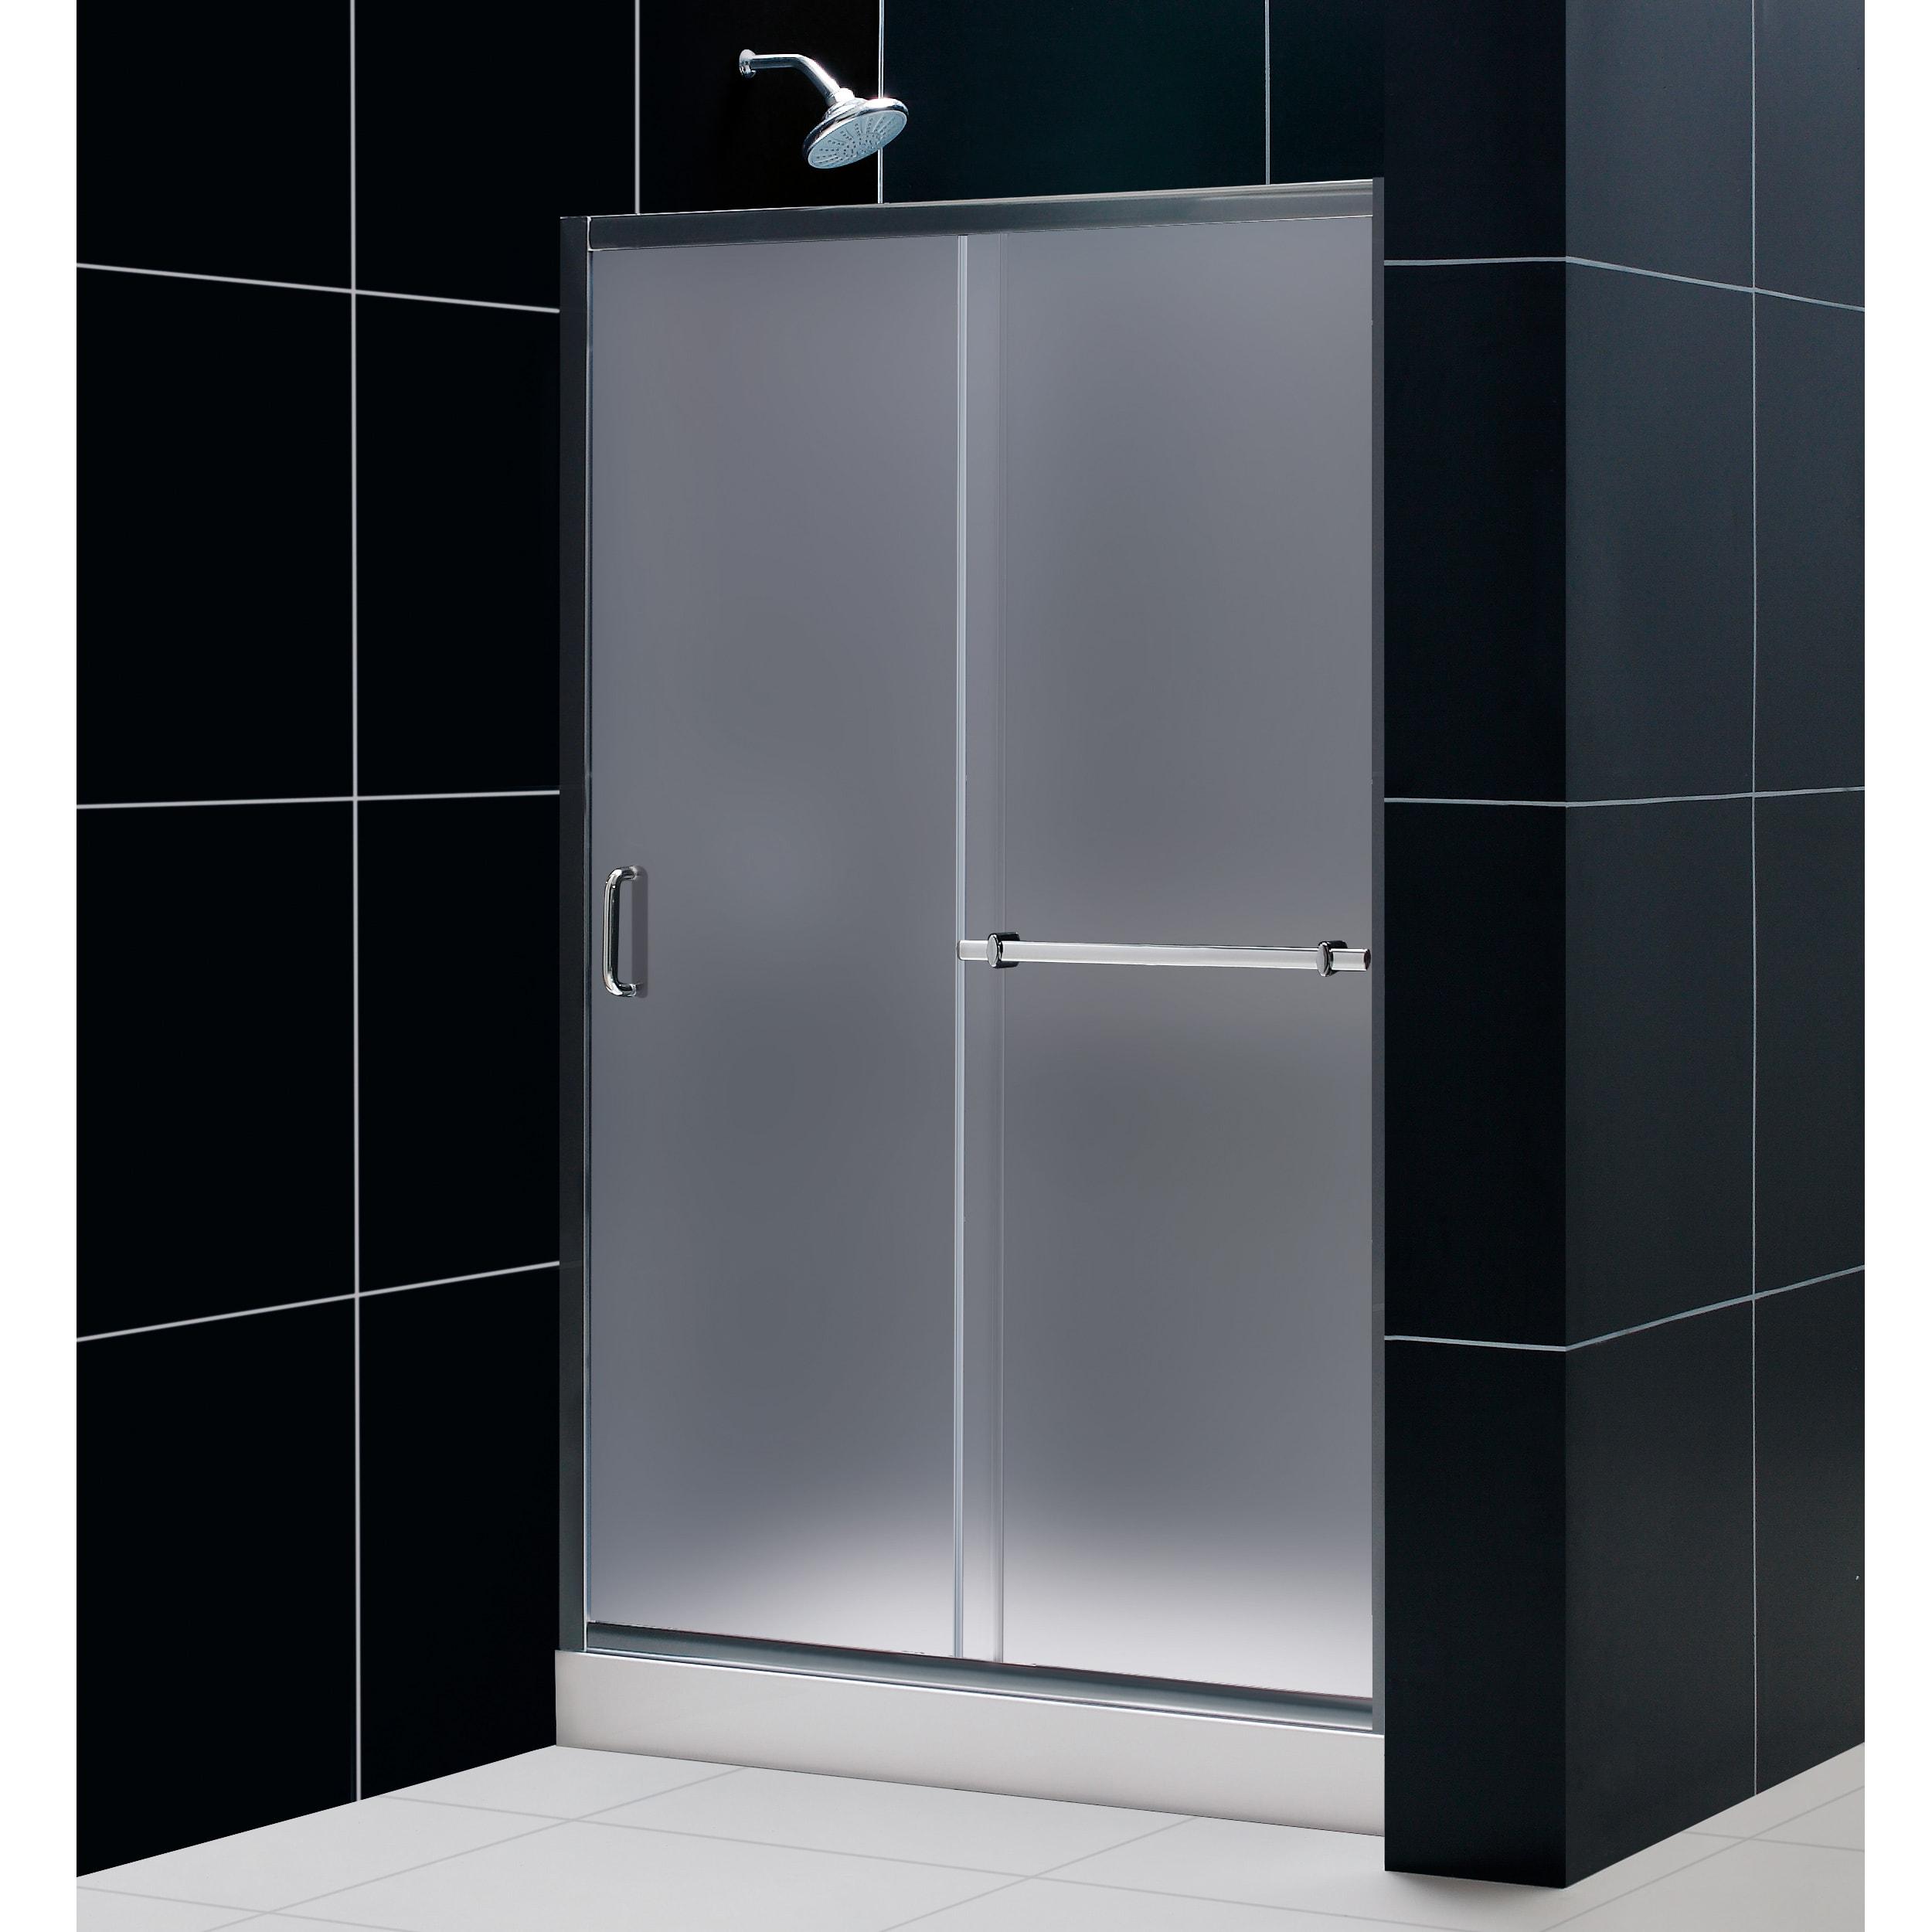 DreamLine Infinity Plus 44-48x72-inch Frosted Glass Shower Door